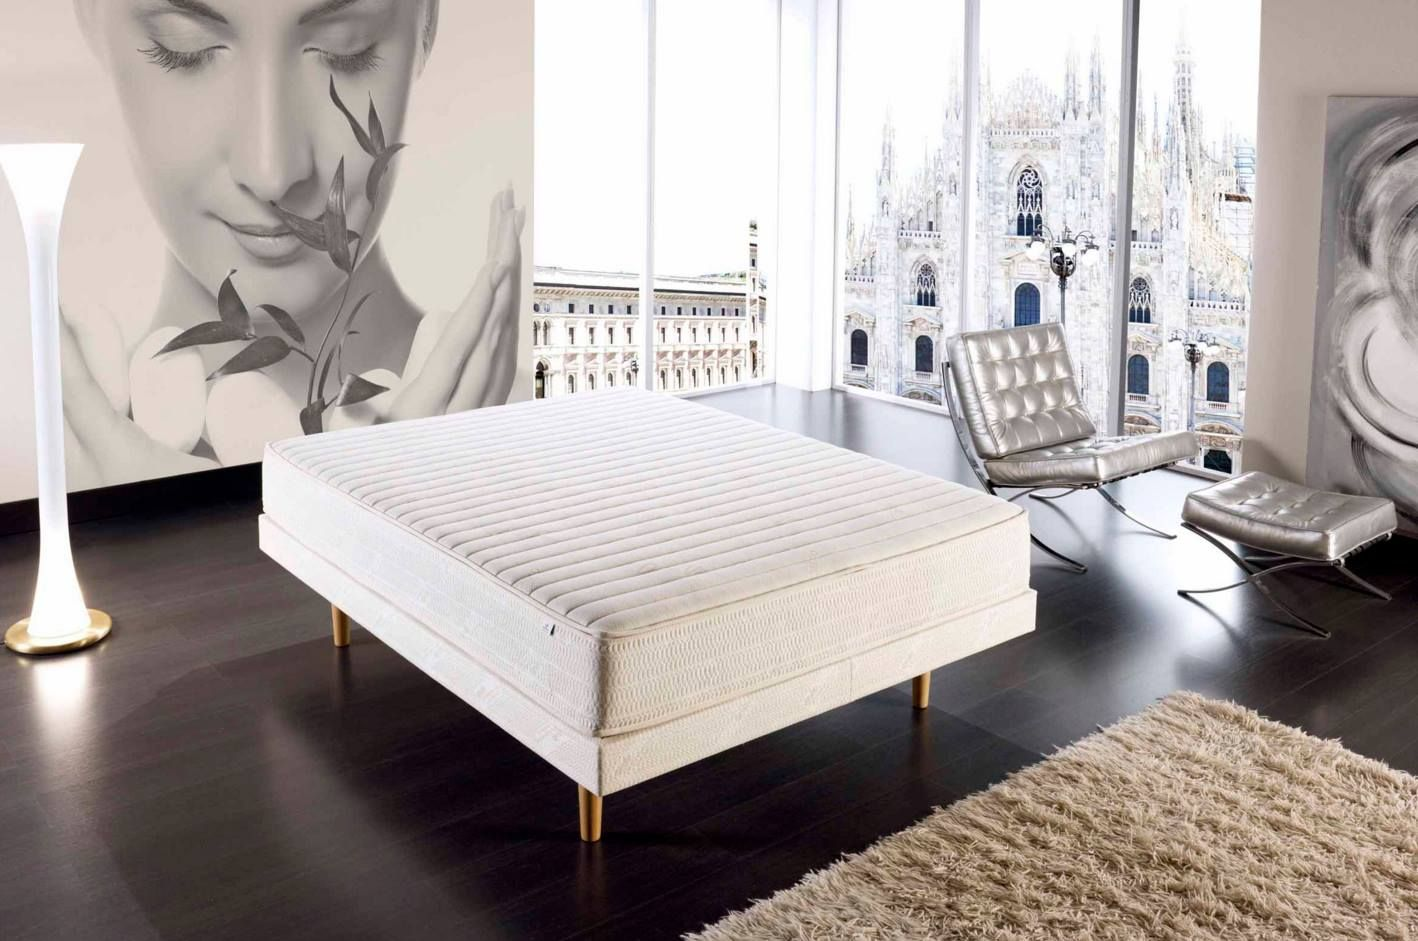 eco friendly mattress sleepongreen ecofriendly mattress